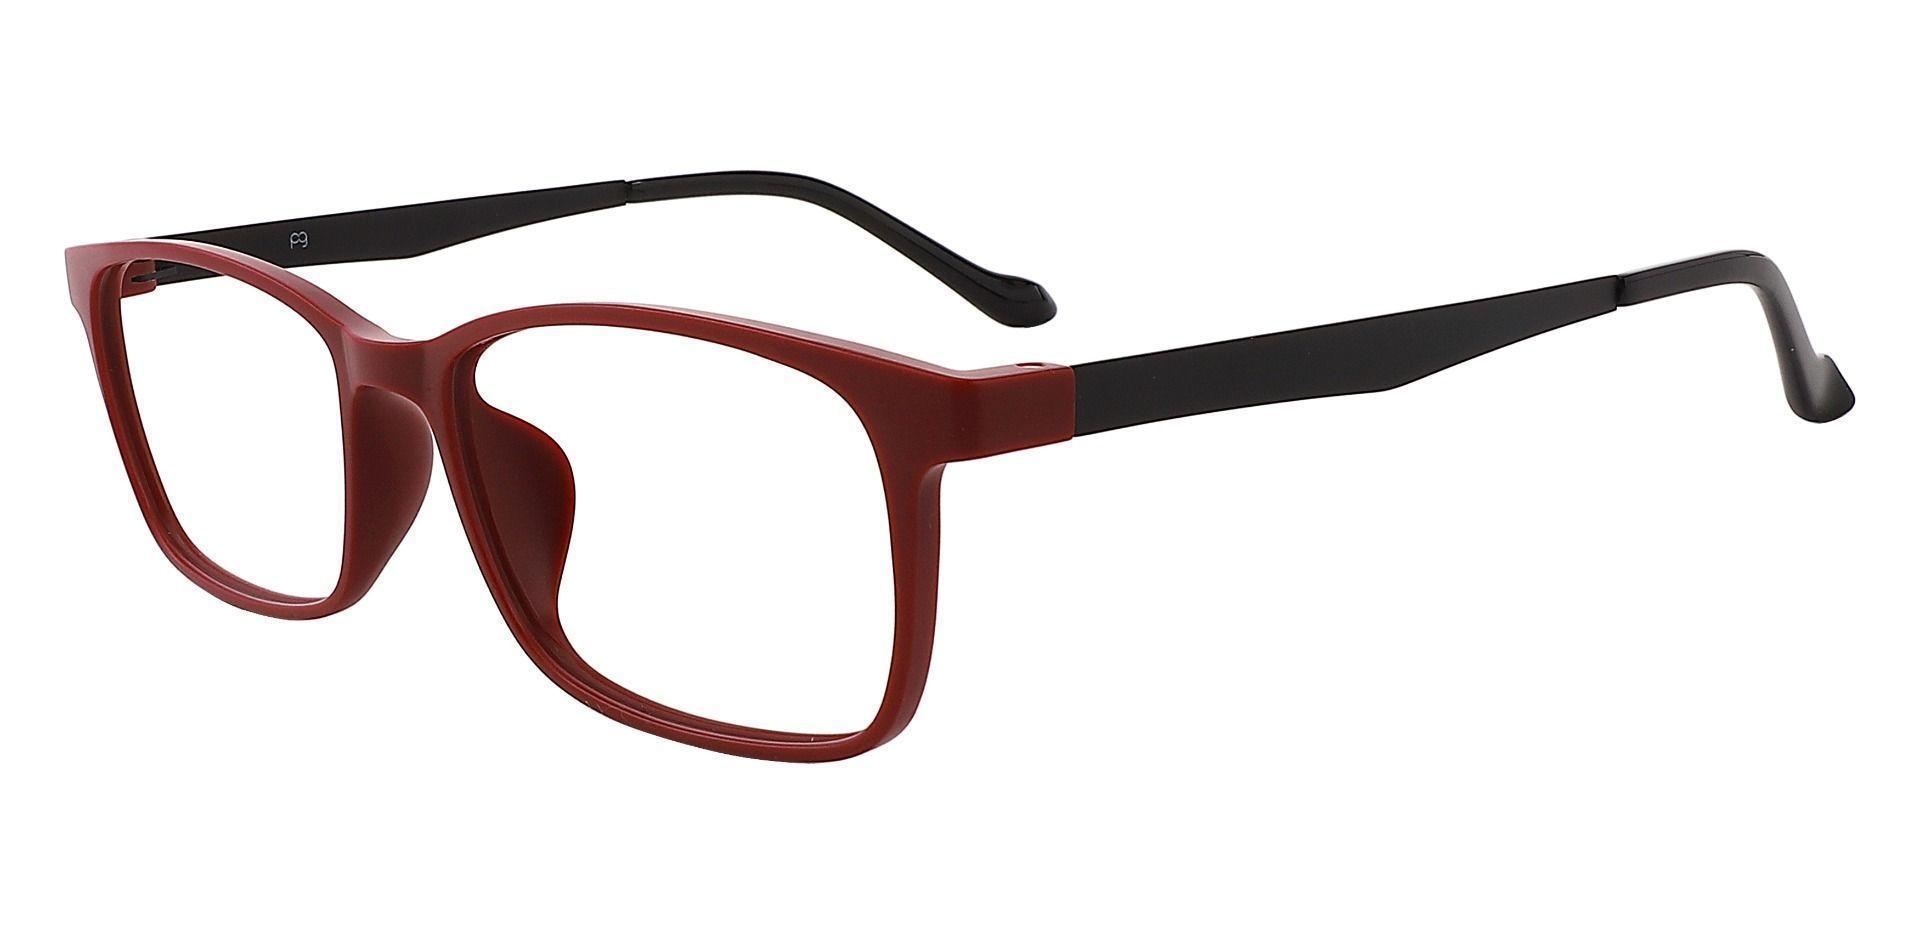 Palmetto Rectangle Blue Light Blocking Glasses - Red